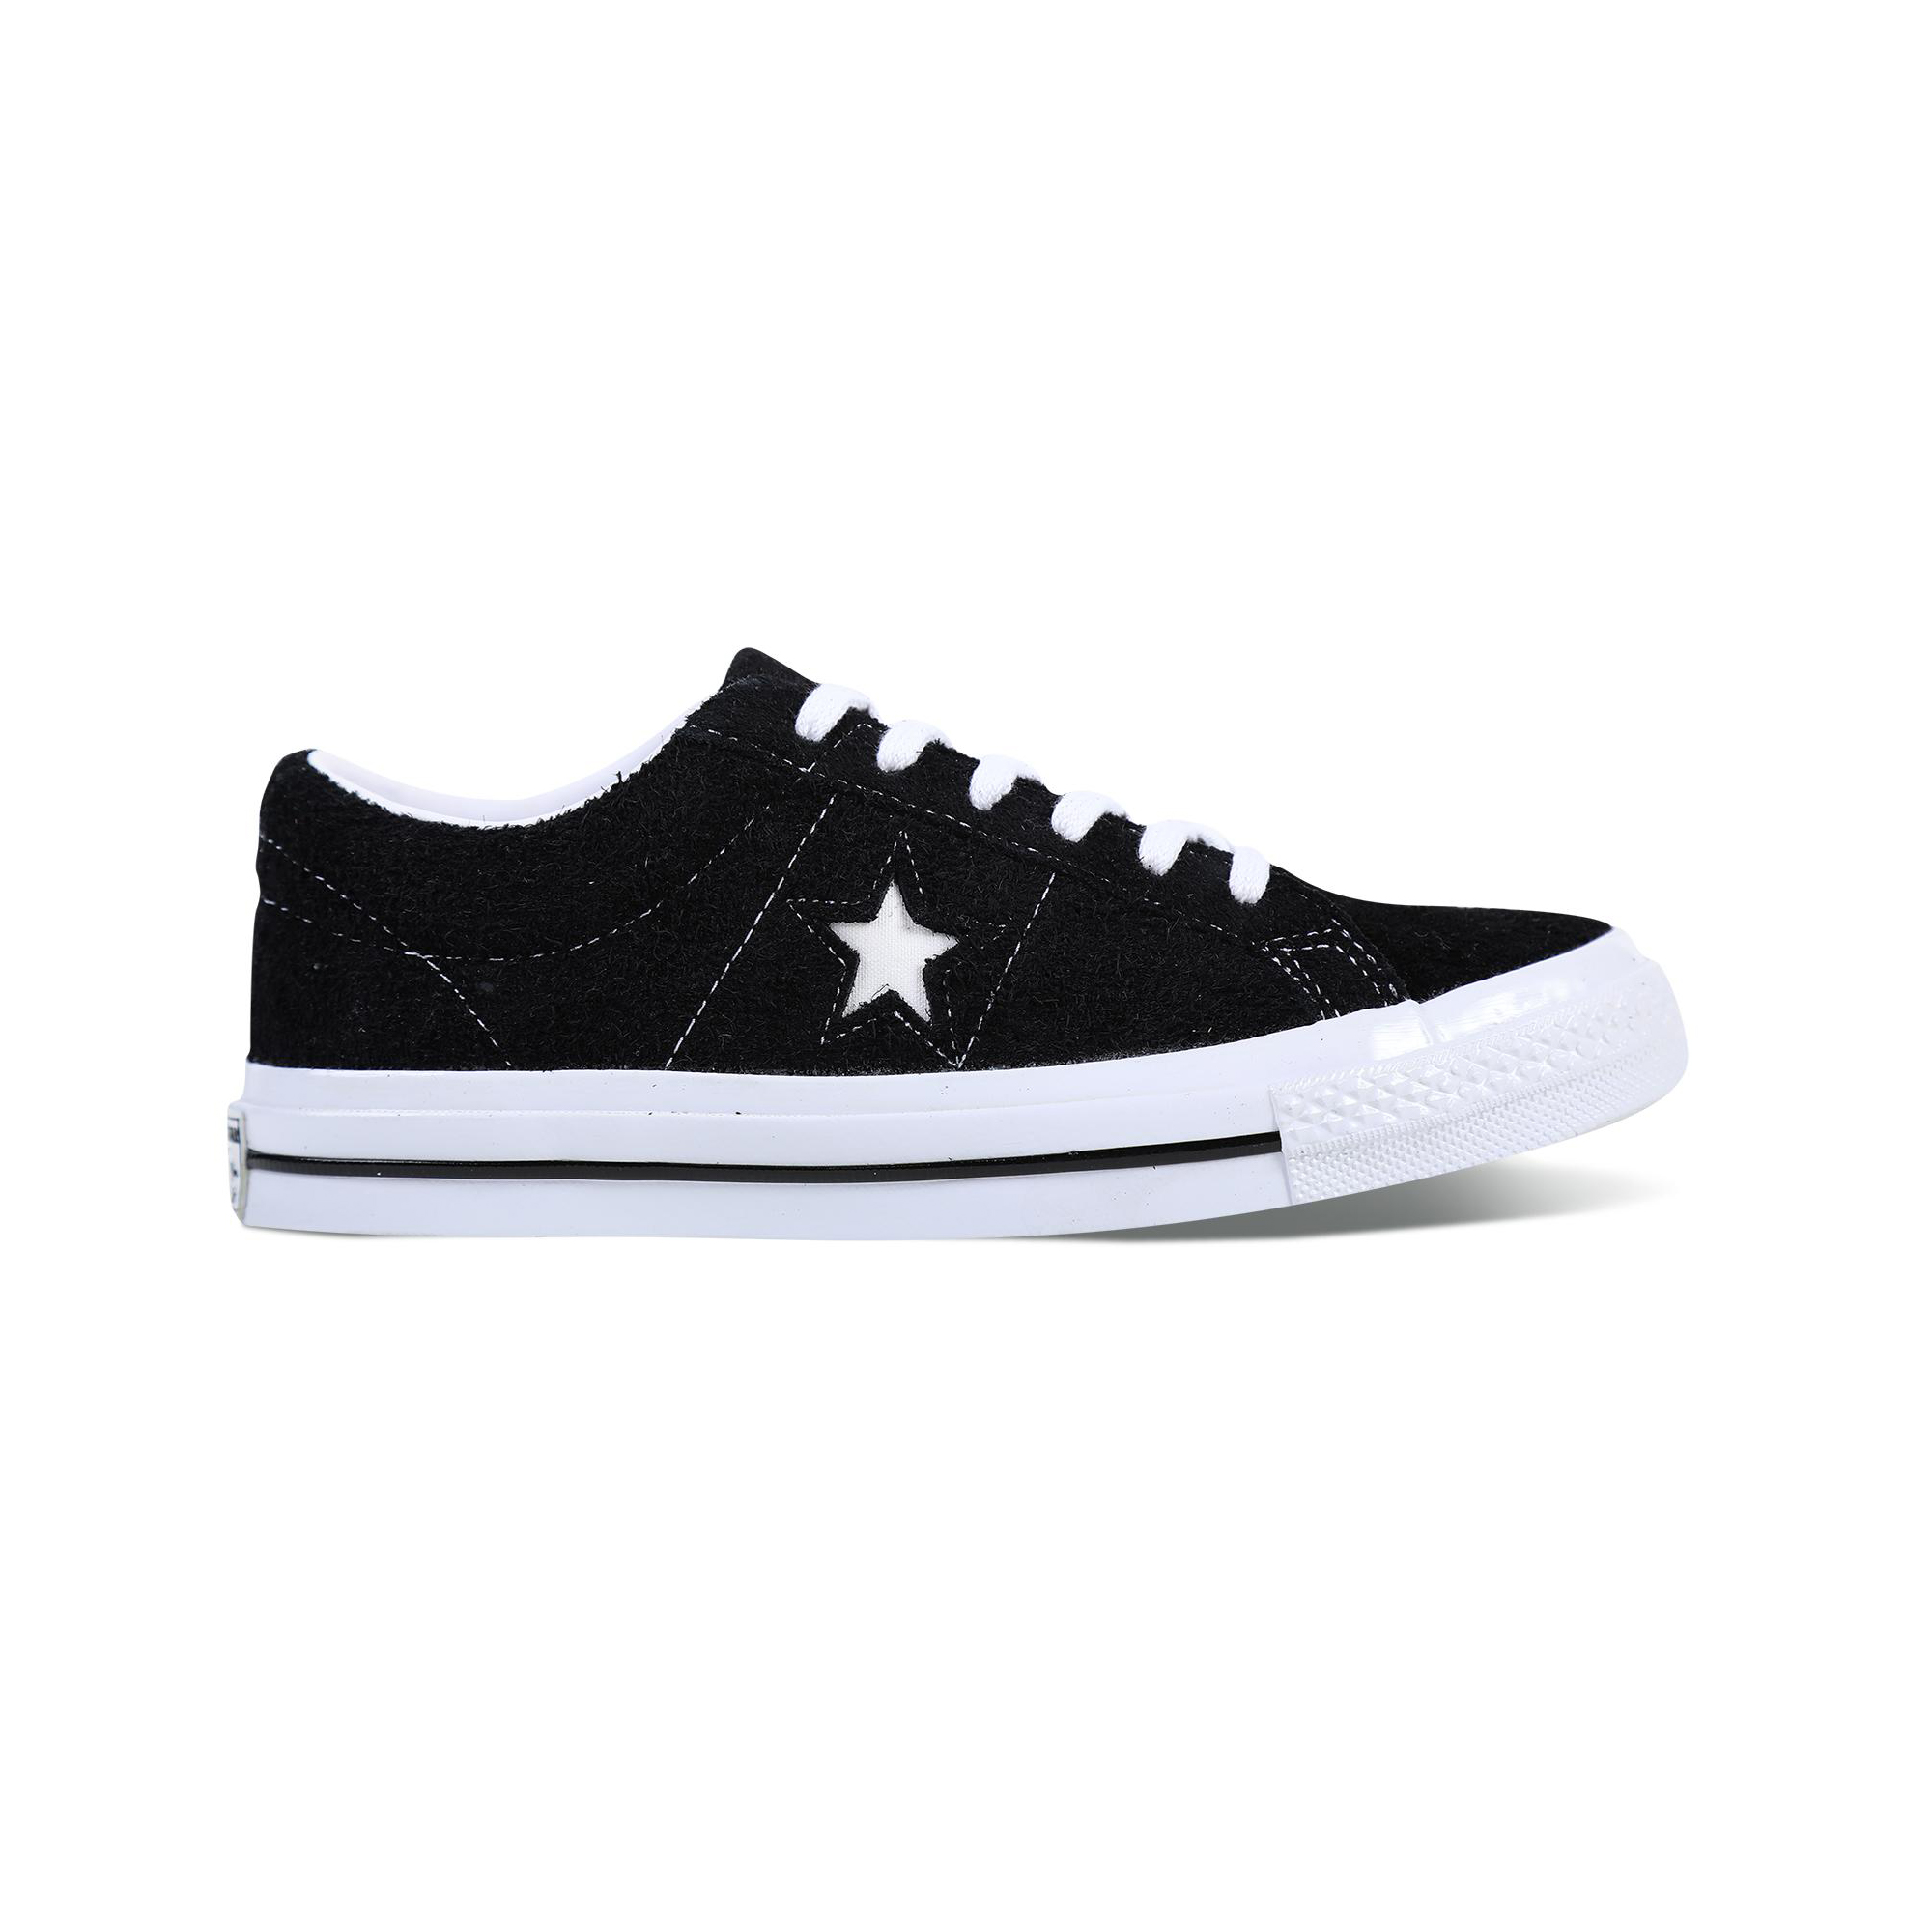 Sale] Converse One Star - Ox - Black